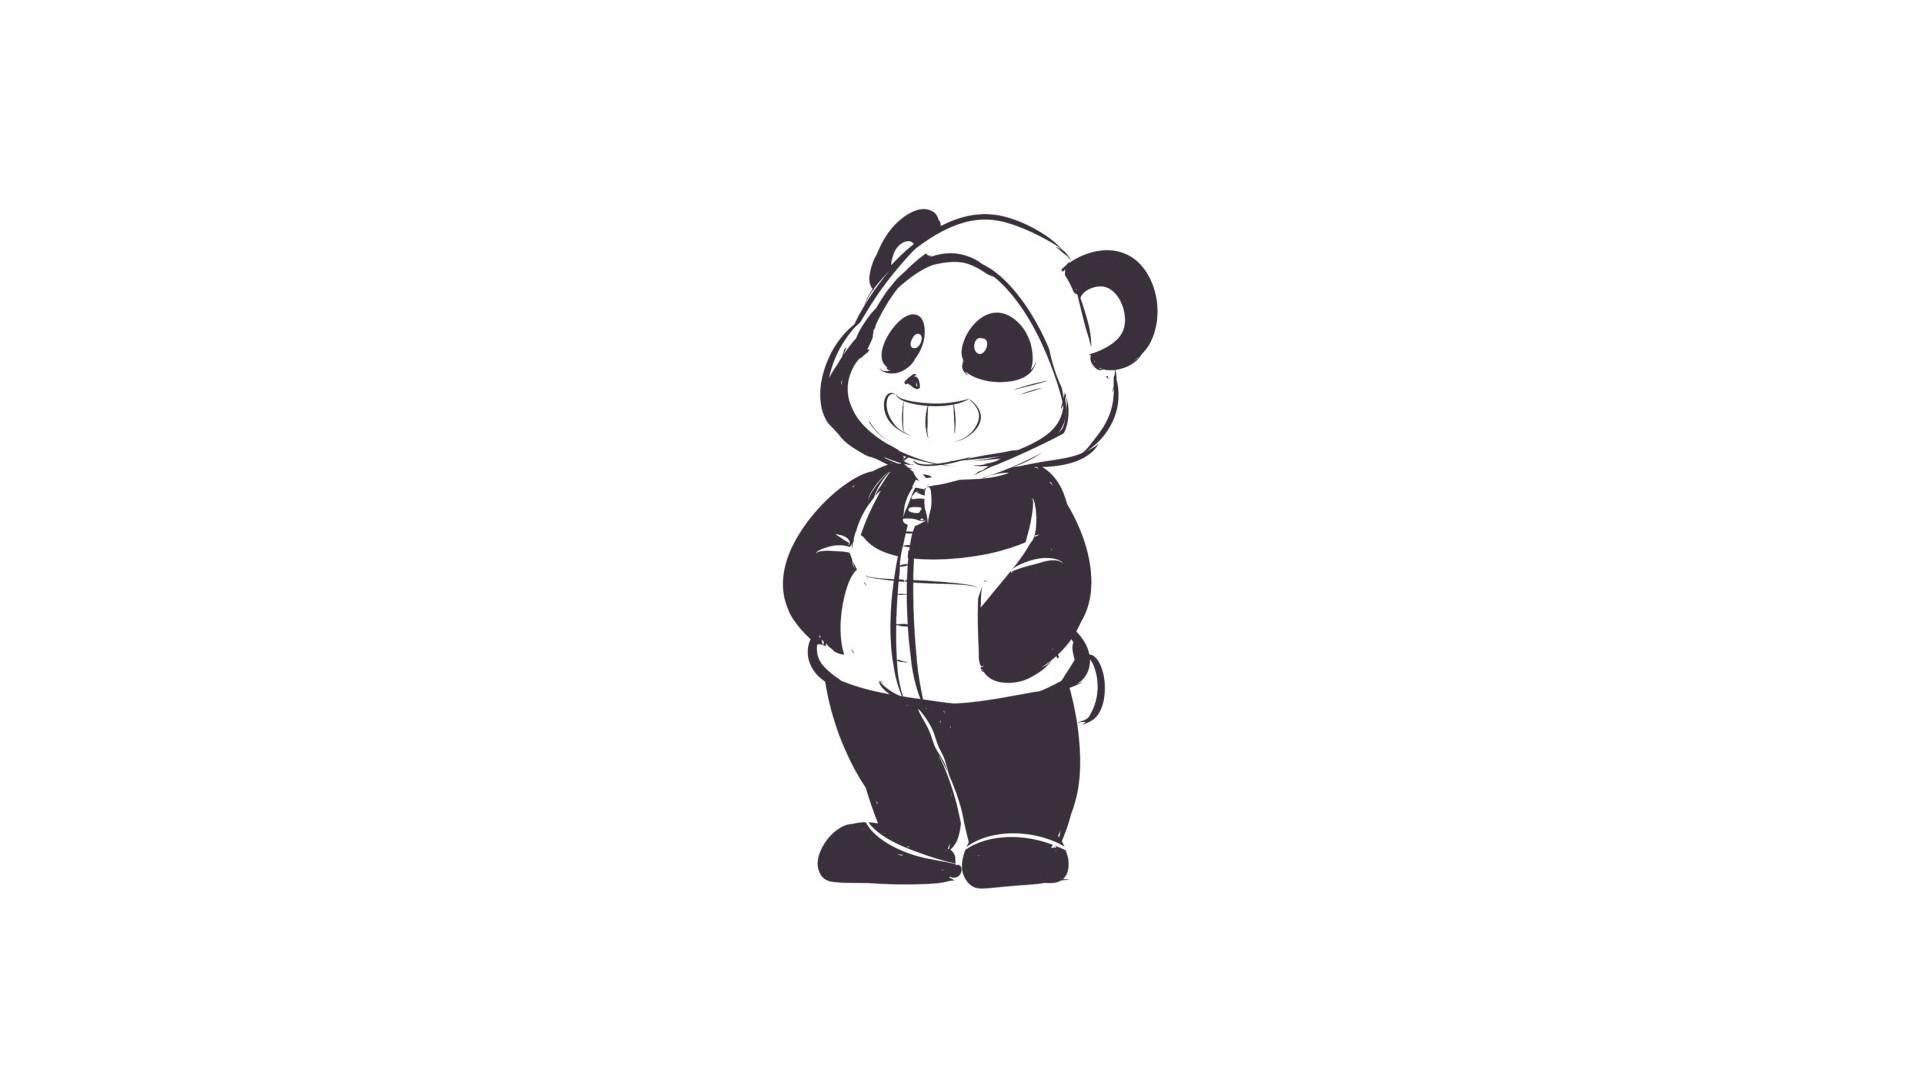 Undertale Panda Sans wallpaper, happy panda wallpaper, hoodie, sketch .